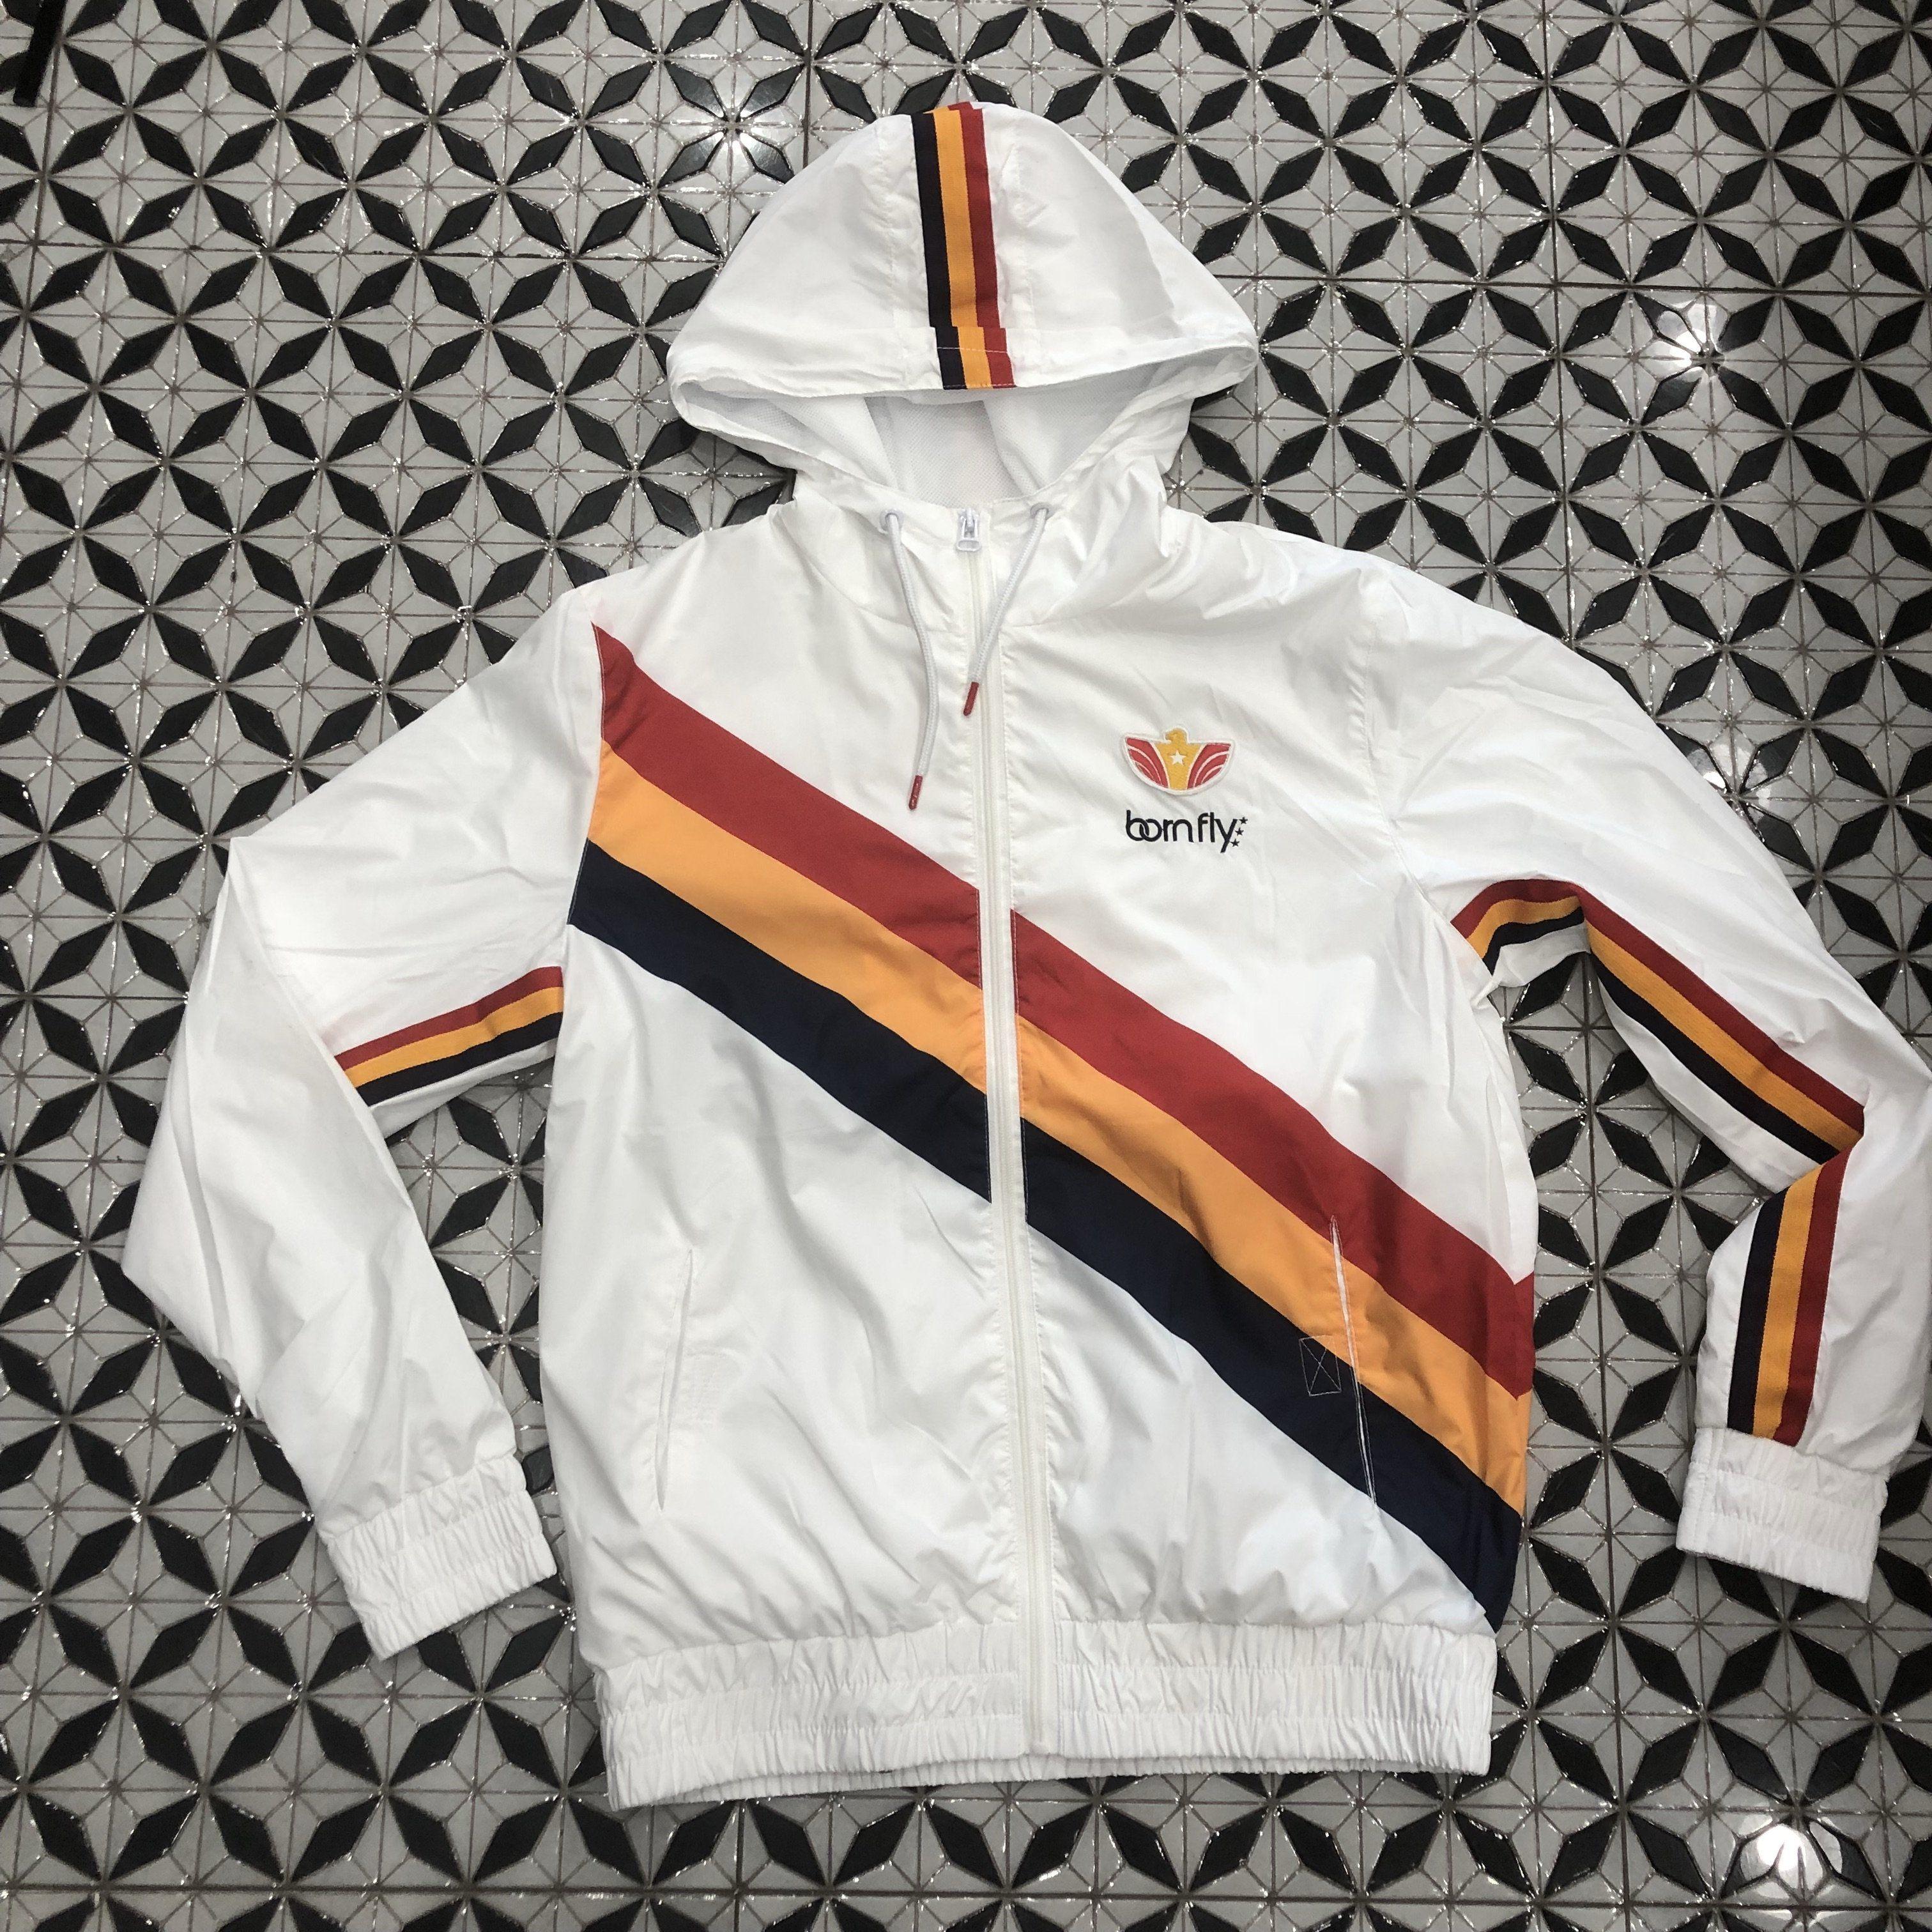 Born Fly White Windbreaker Jacket Coats Jackets White